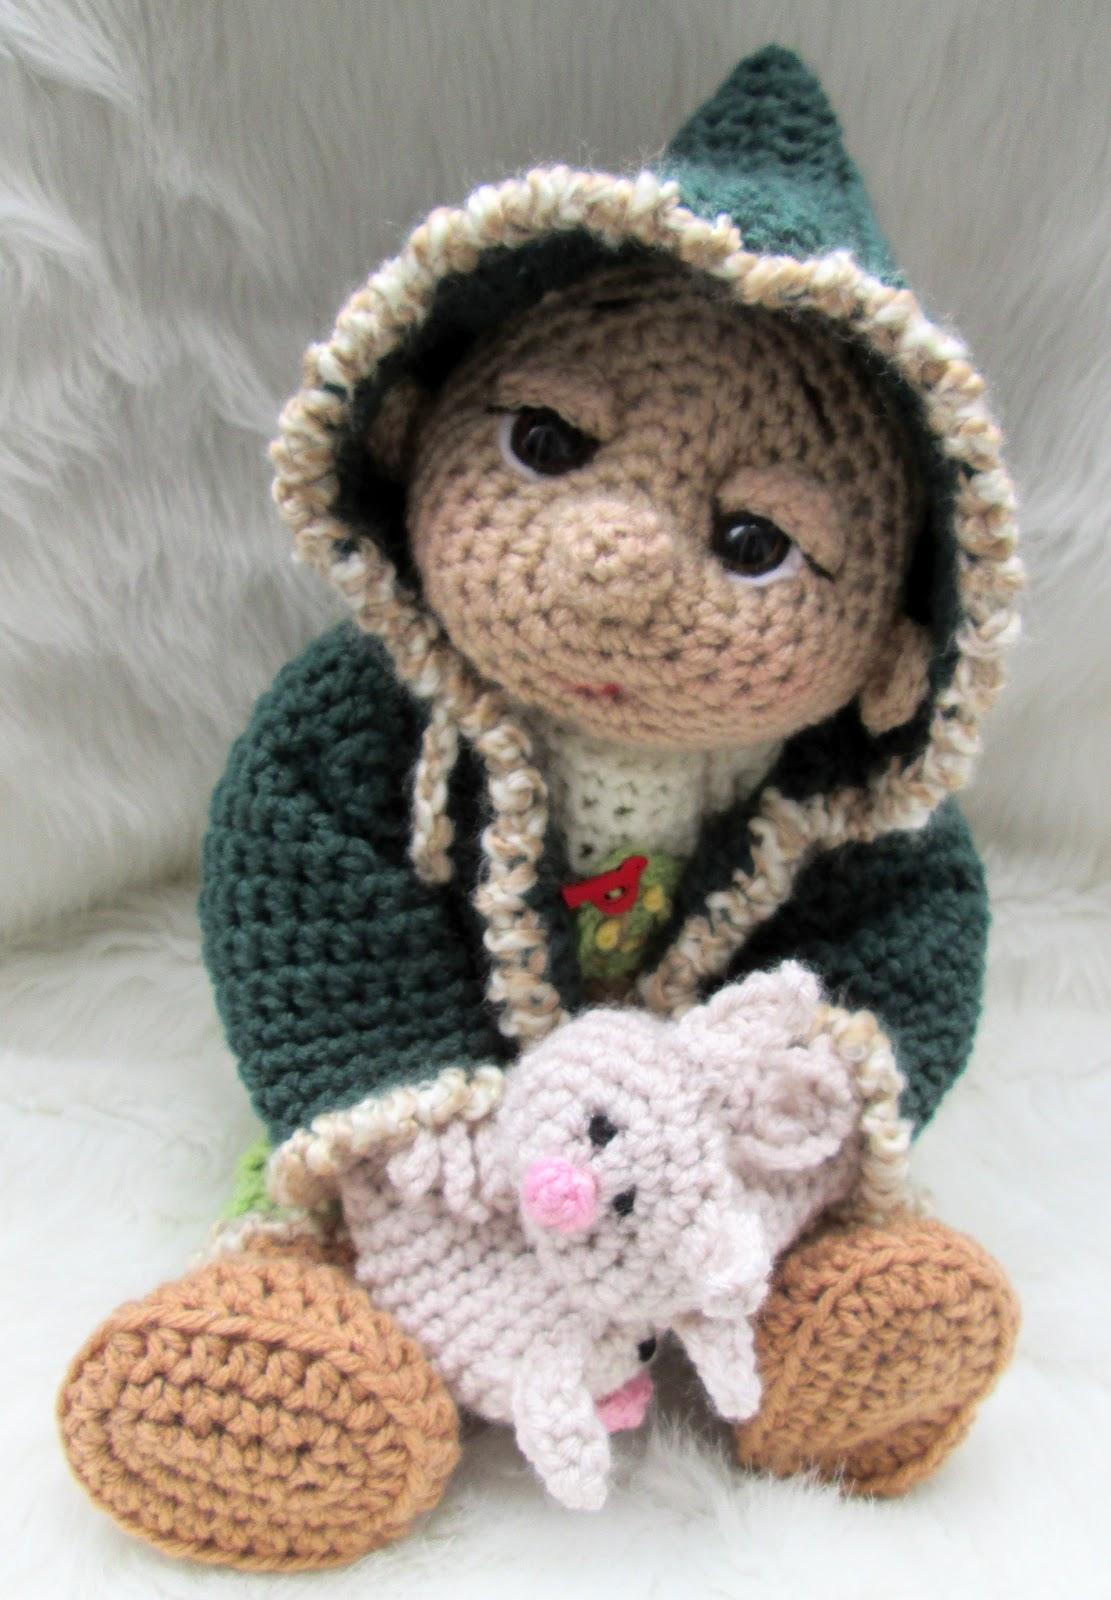 teri's blog: so cute baby winter wear set